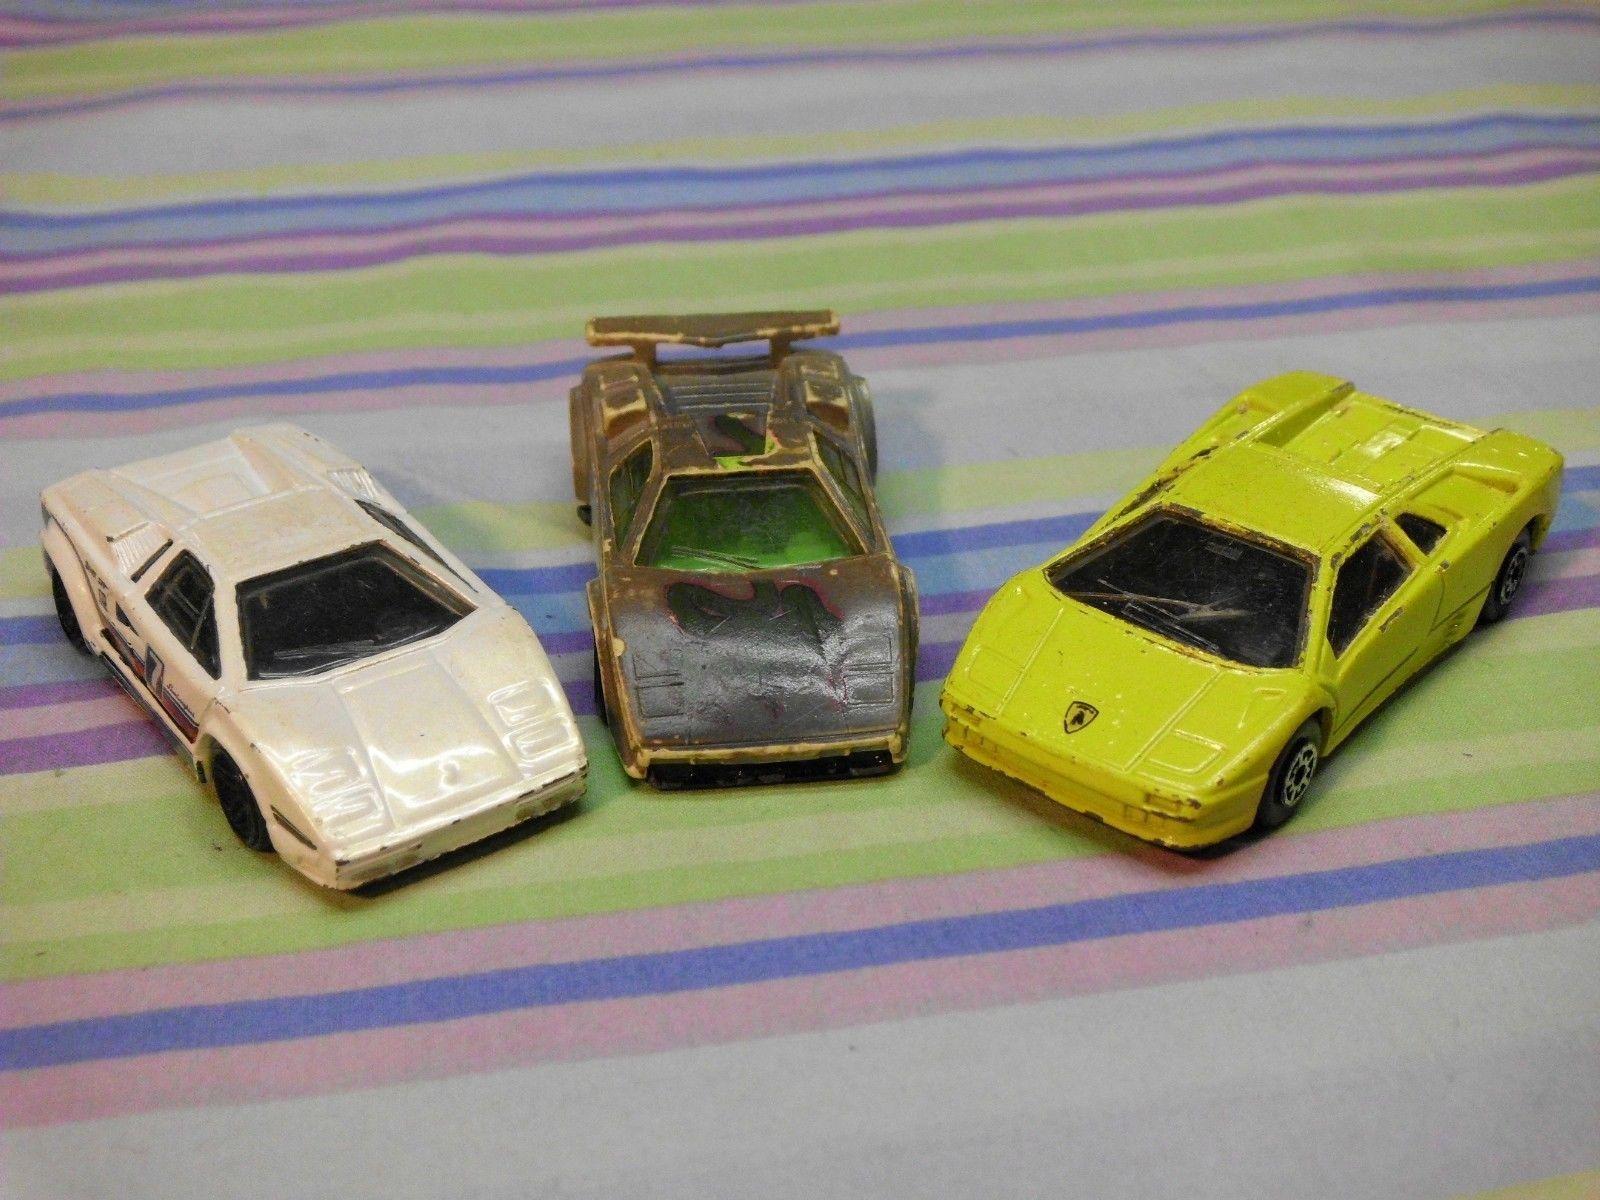 a8dc7a3206929b402855b32c34f042e4 Breathtaking Lamborghini Countach Owners Manual Pdf Cars Trend